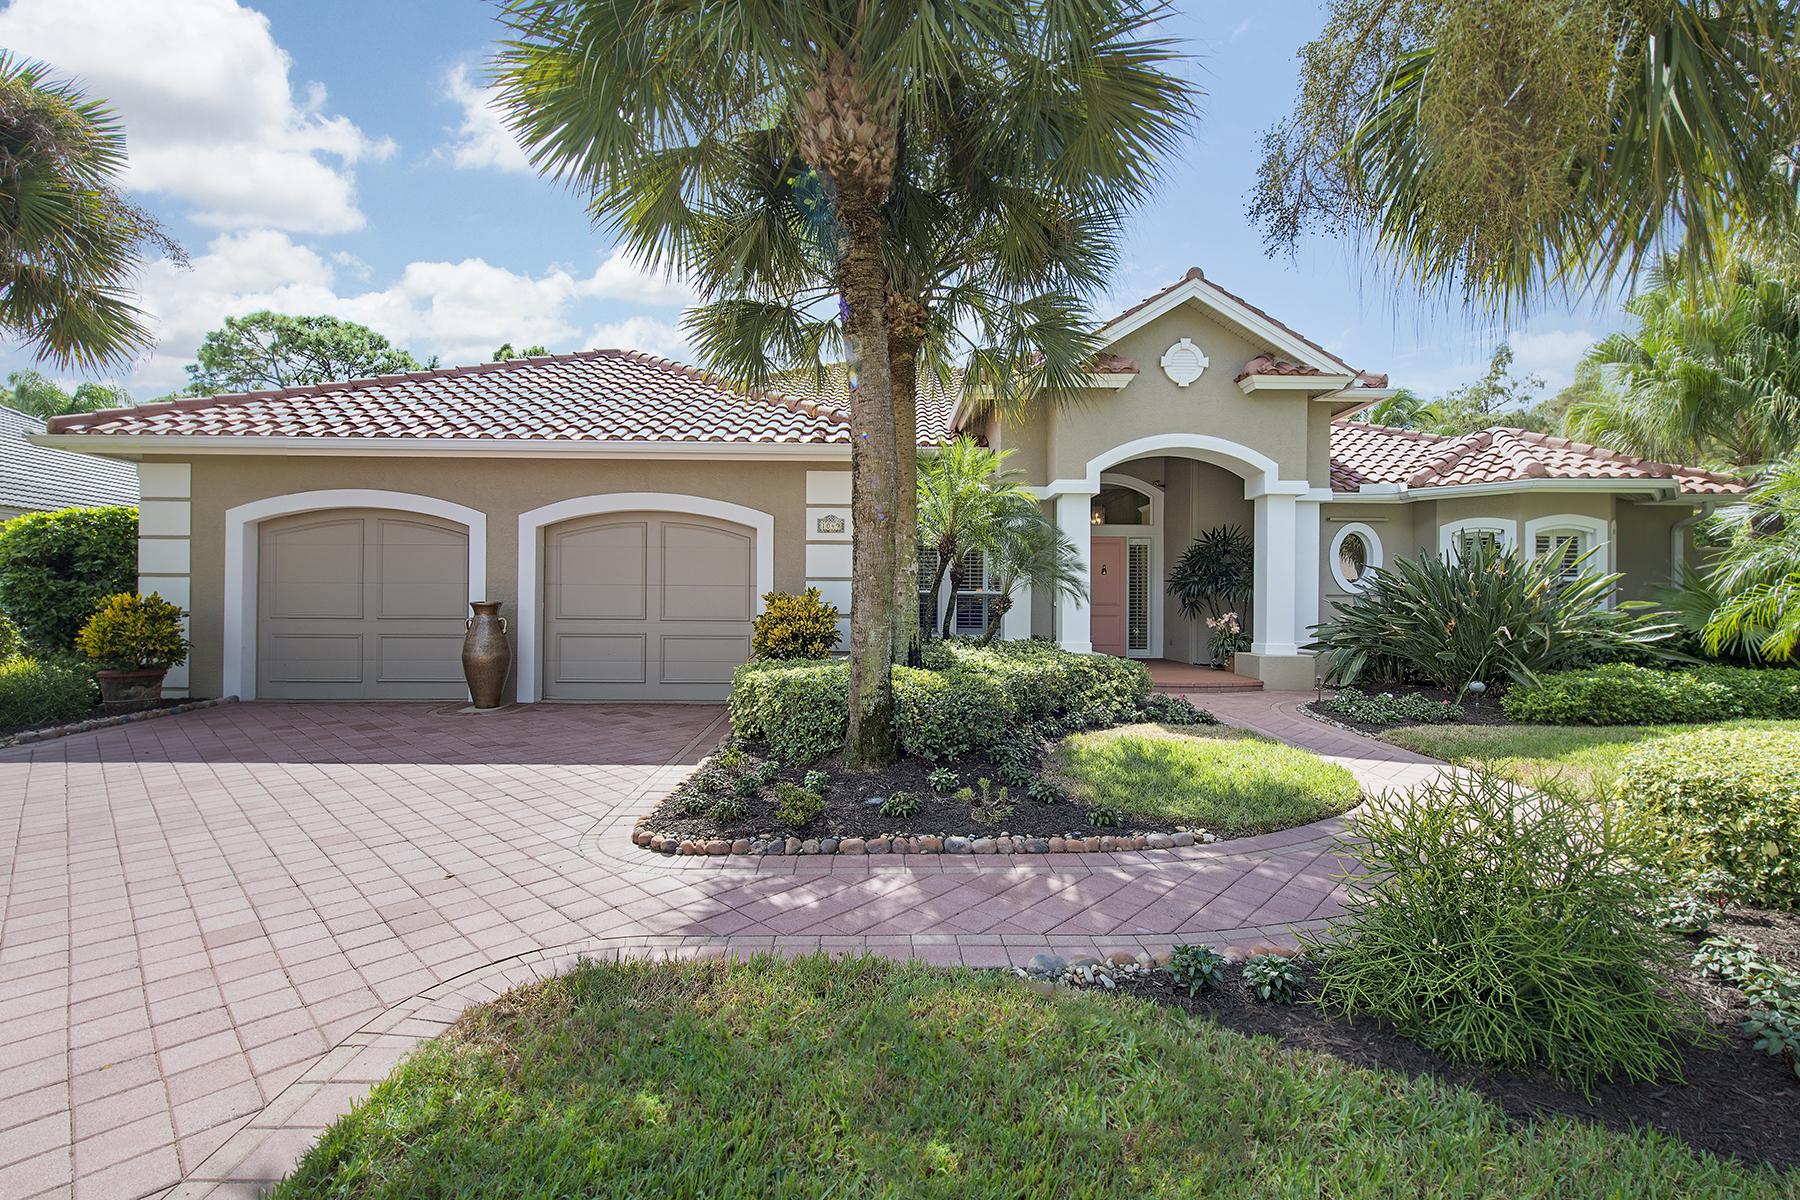 Casa Unifamiliar por un Venta en PELICAN MARSH - THE GABLES 1049 Spanish Moss Trl Naples, Florida 34108 Estados Unidos